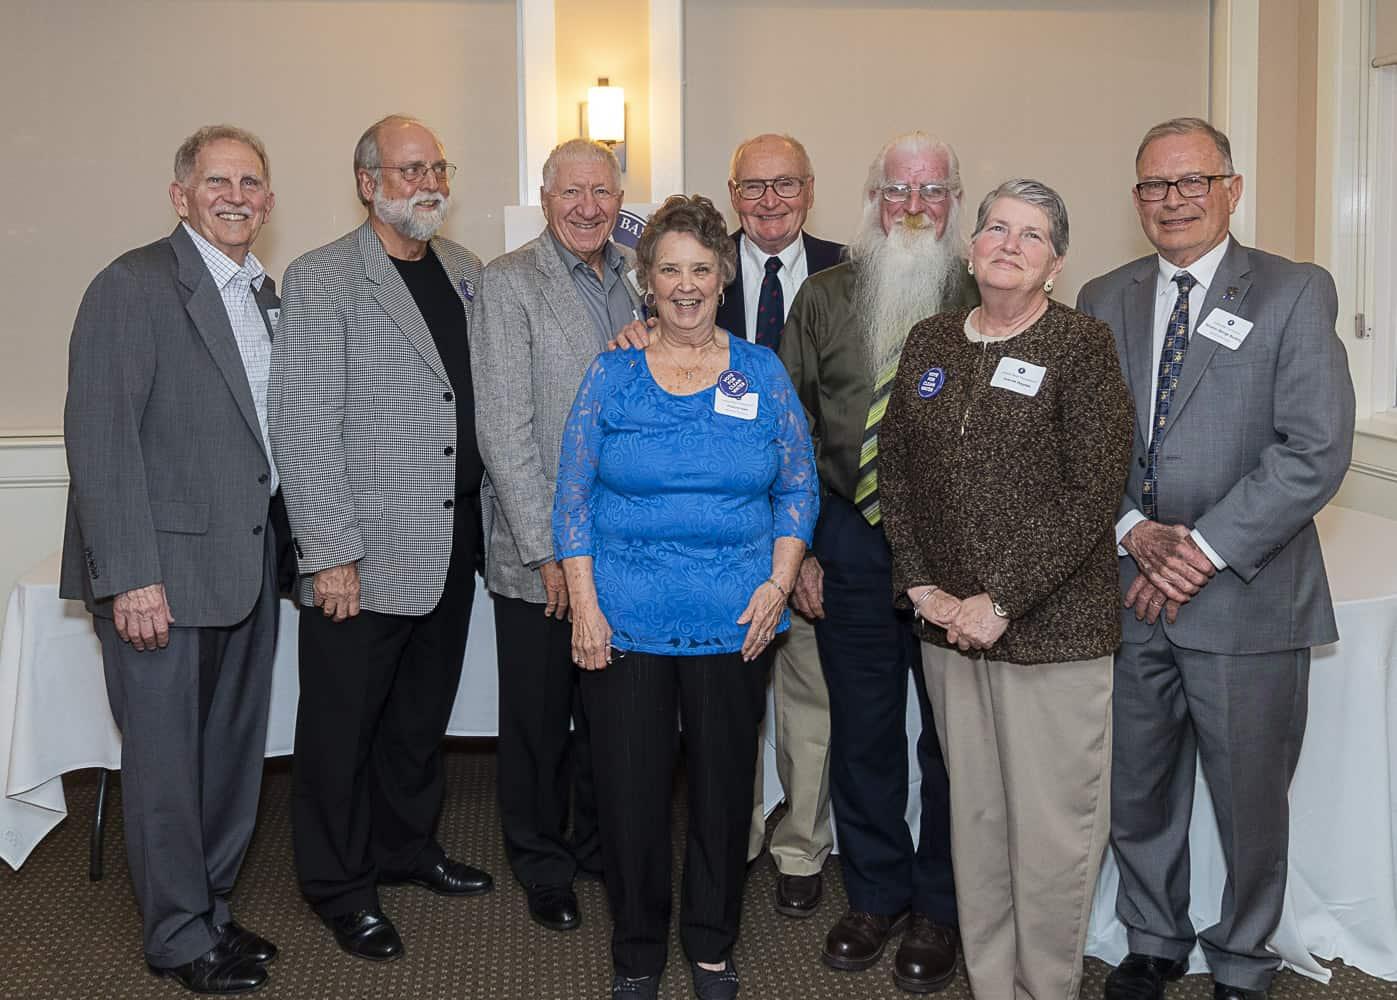 IBF Board members : Left to right, front row: Frances Hart and Joanne Haynes (IBF Member) Left to Right Back Row: Chuck Schonder, Lew Podolske (Treasurer), Al Allenspach, Dave Joeger (Prisident), Ken Haynes, Sen. George Bunting (former state senator)